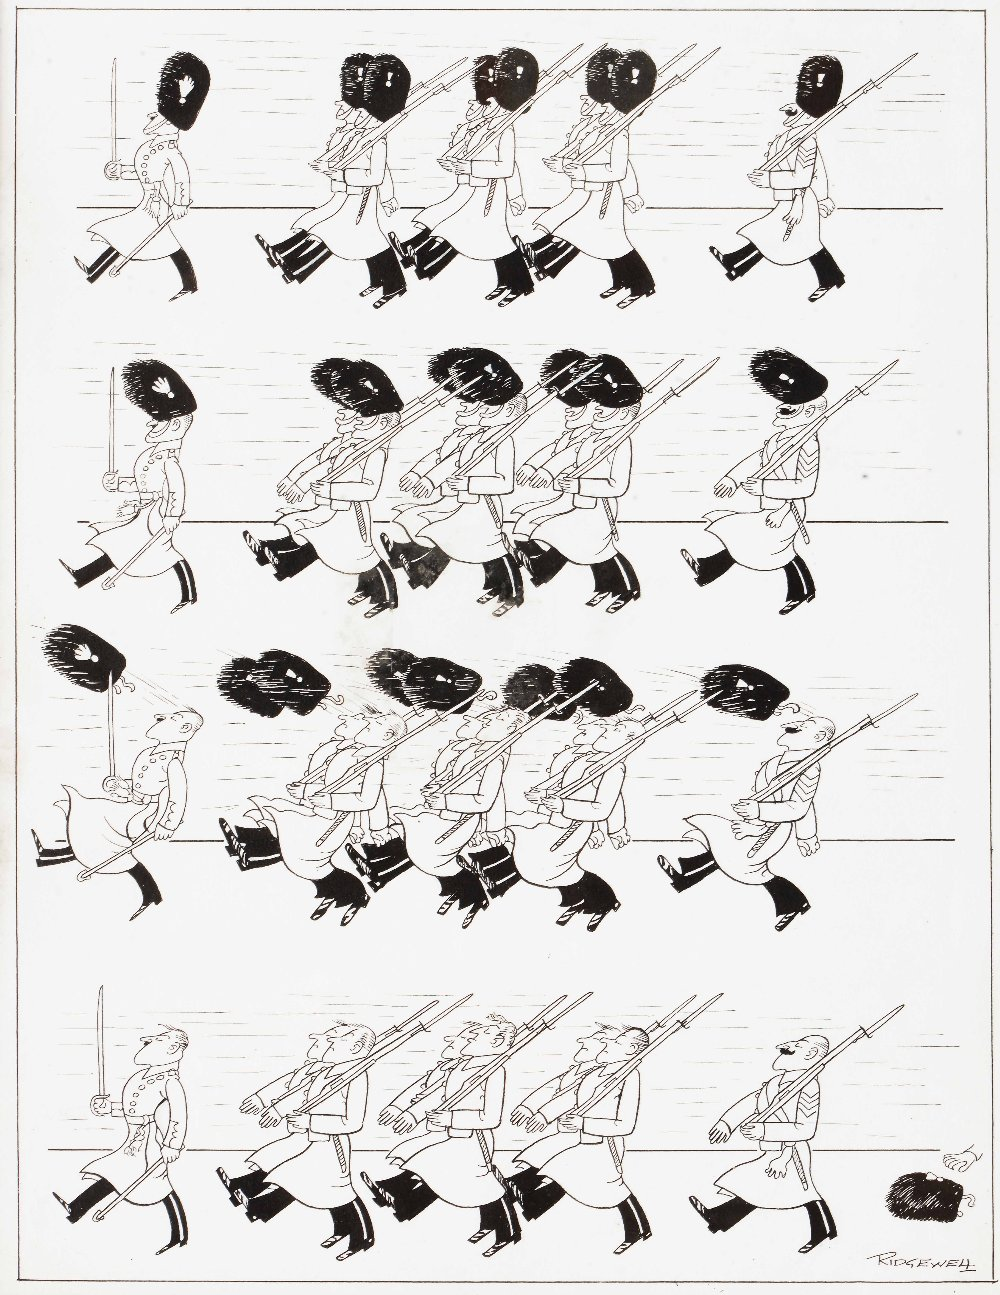 Lot 184 - WILLIAM RIDGEWELL (1881-1937) 'Discipline', signed and titled, original cartoon, pen and ink,